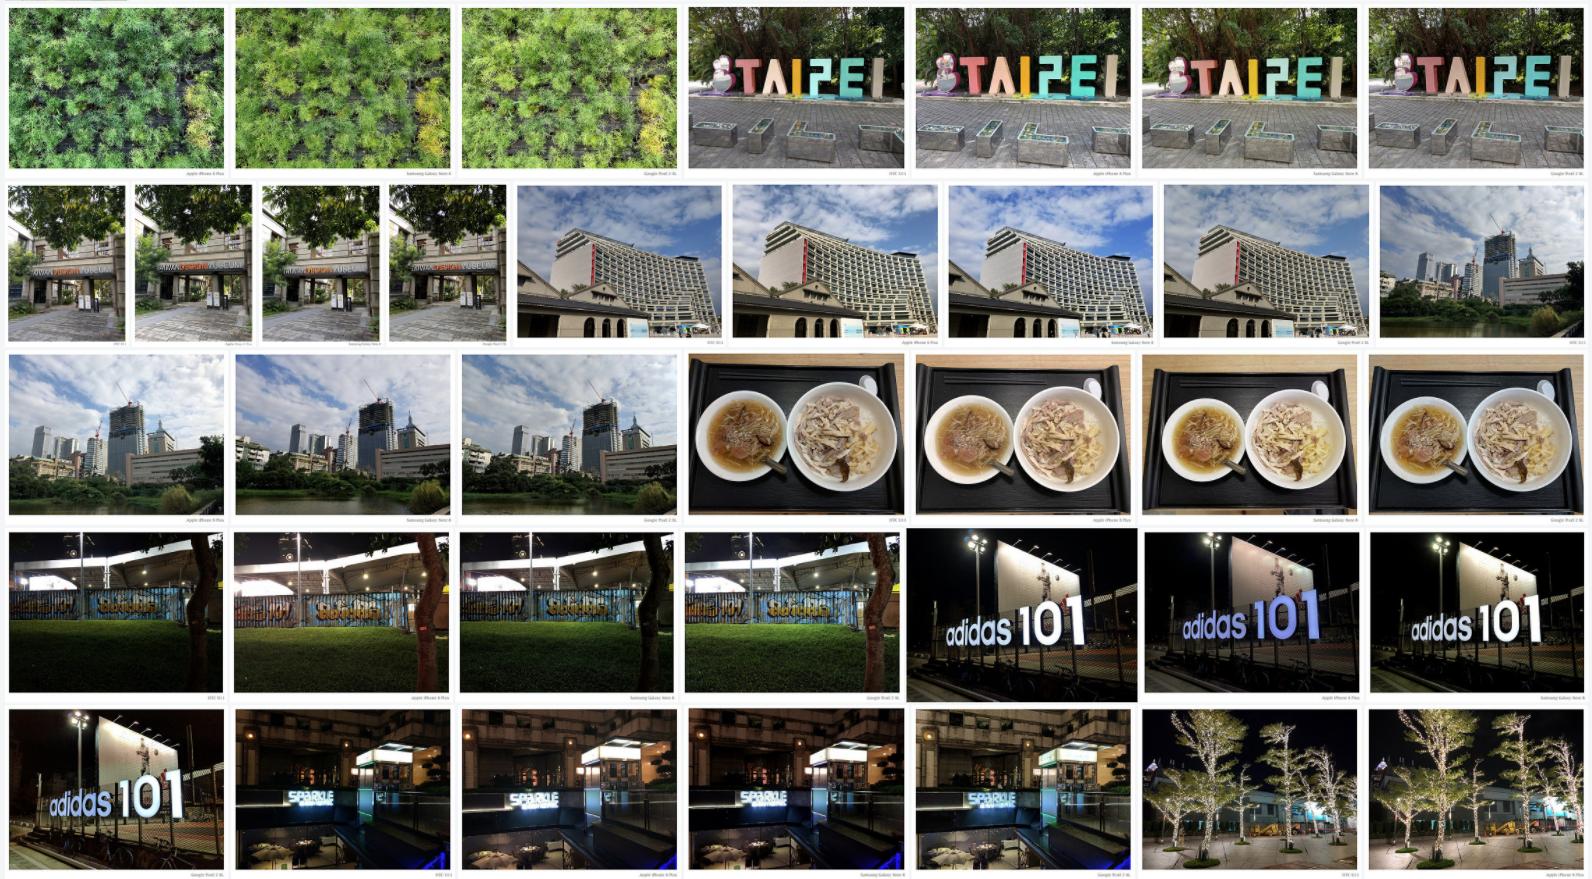 Google Pixel 2 XL 評測 (2) 拍照最強王者?!Pixel 2 XL 拍照實測 + 對比 iPhone 8 Plus / Note 8 / U11 (Google Pixel 2 XL Camera Review + iPhone 8 Plus / Note 8 vs hTC U11 Comparison) @3C 達人廖阿輝